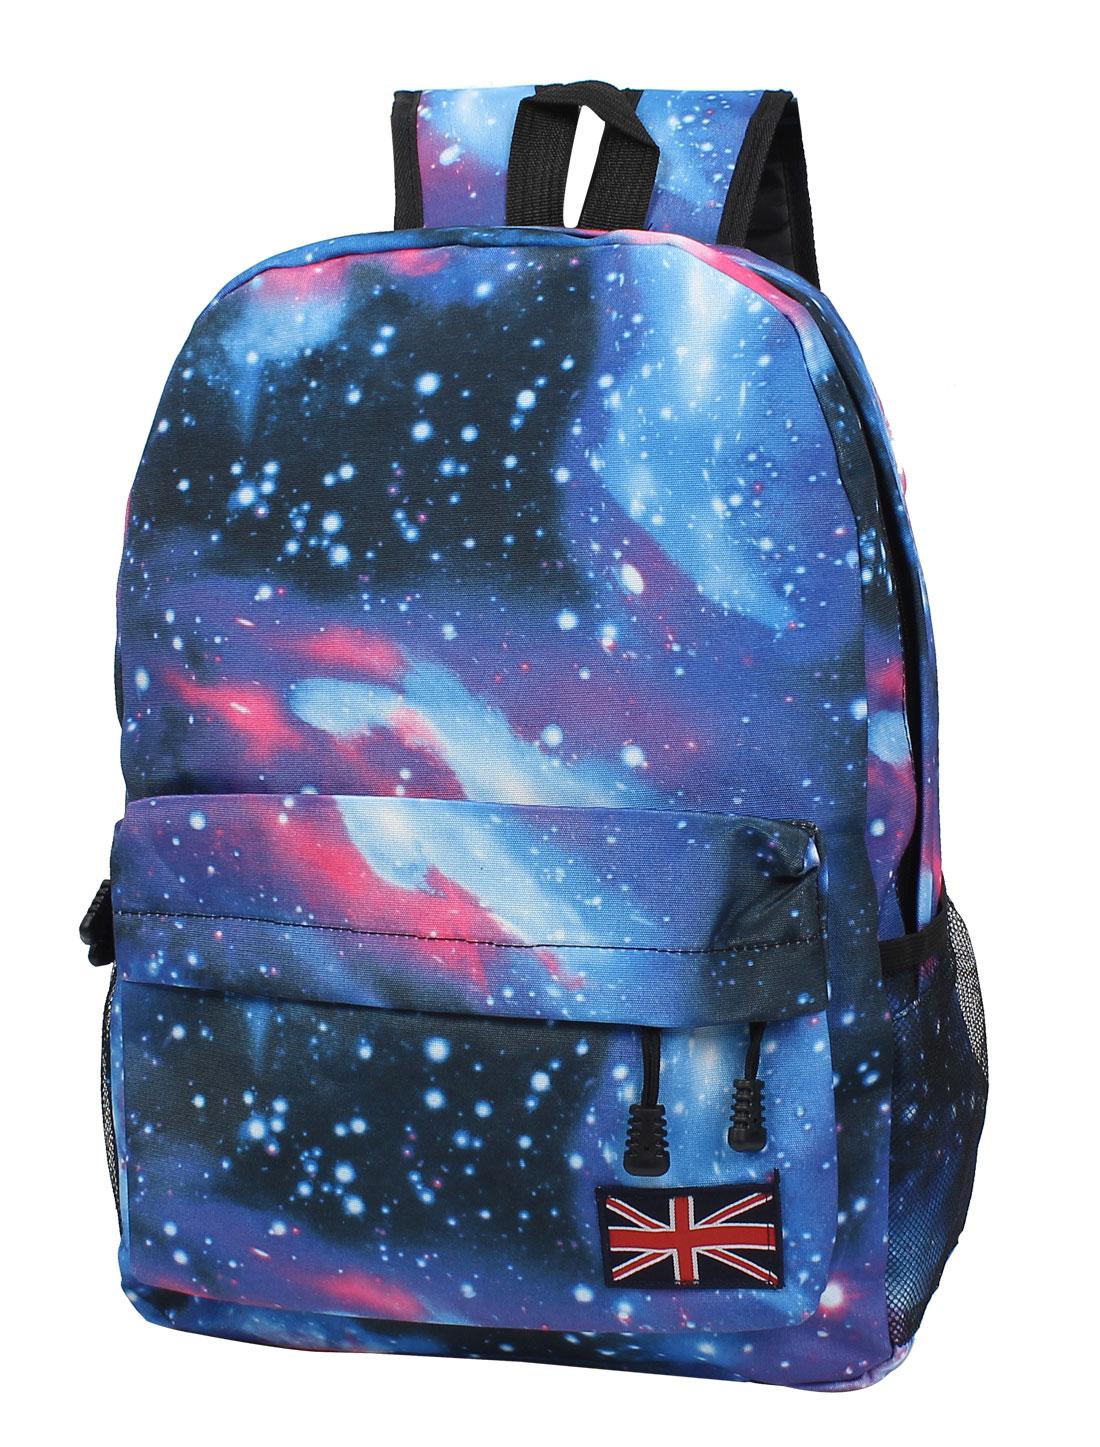 New Galaxy Space Backpack Rucksack Canvas Bag School Bookbag Satchel Blue